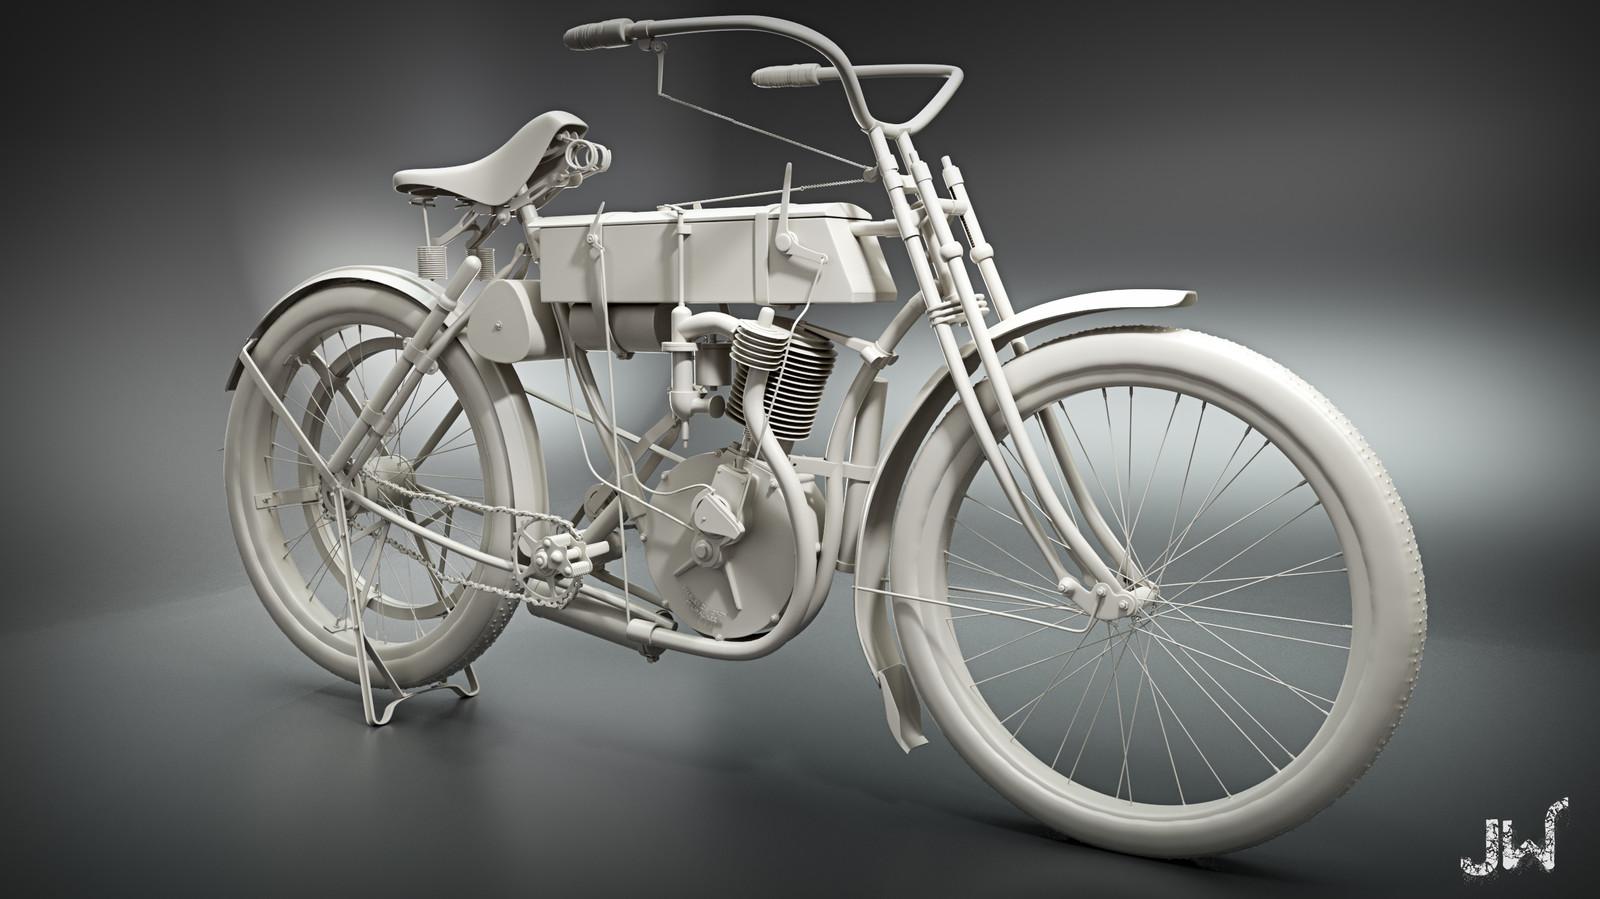 1907 Harley Davidson